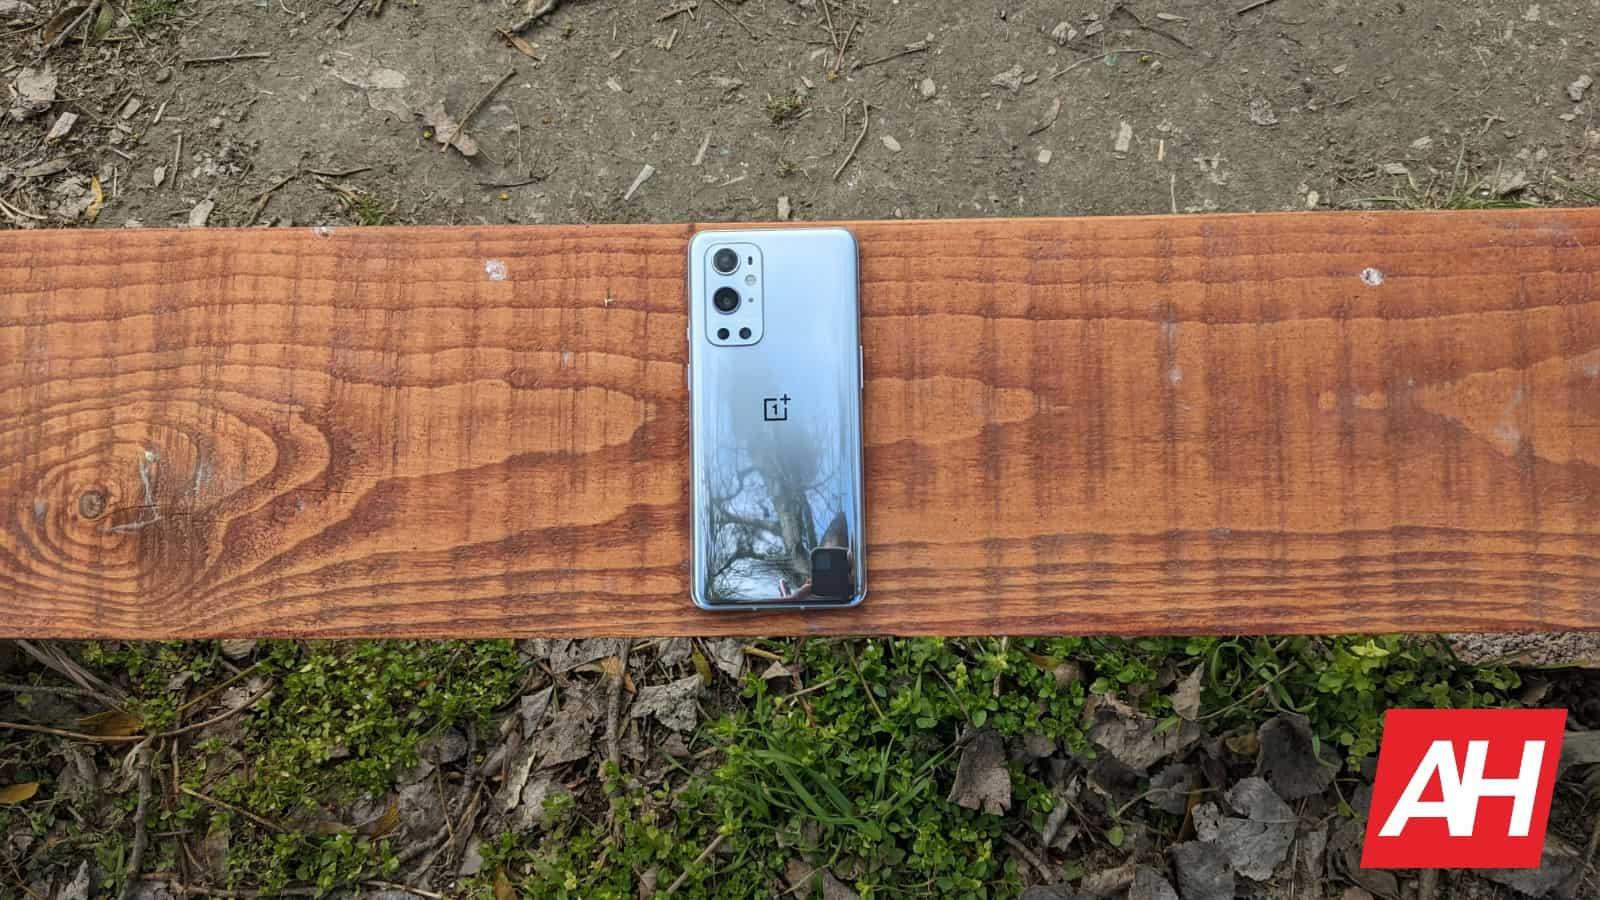 AH OnePlus 9 Pro KL image 9